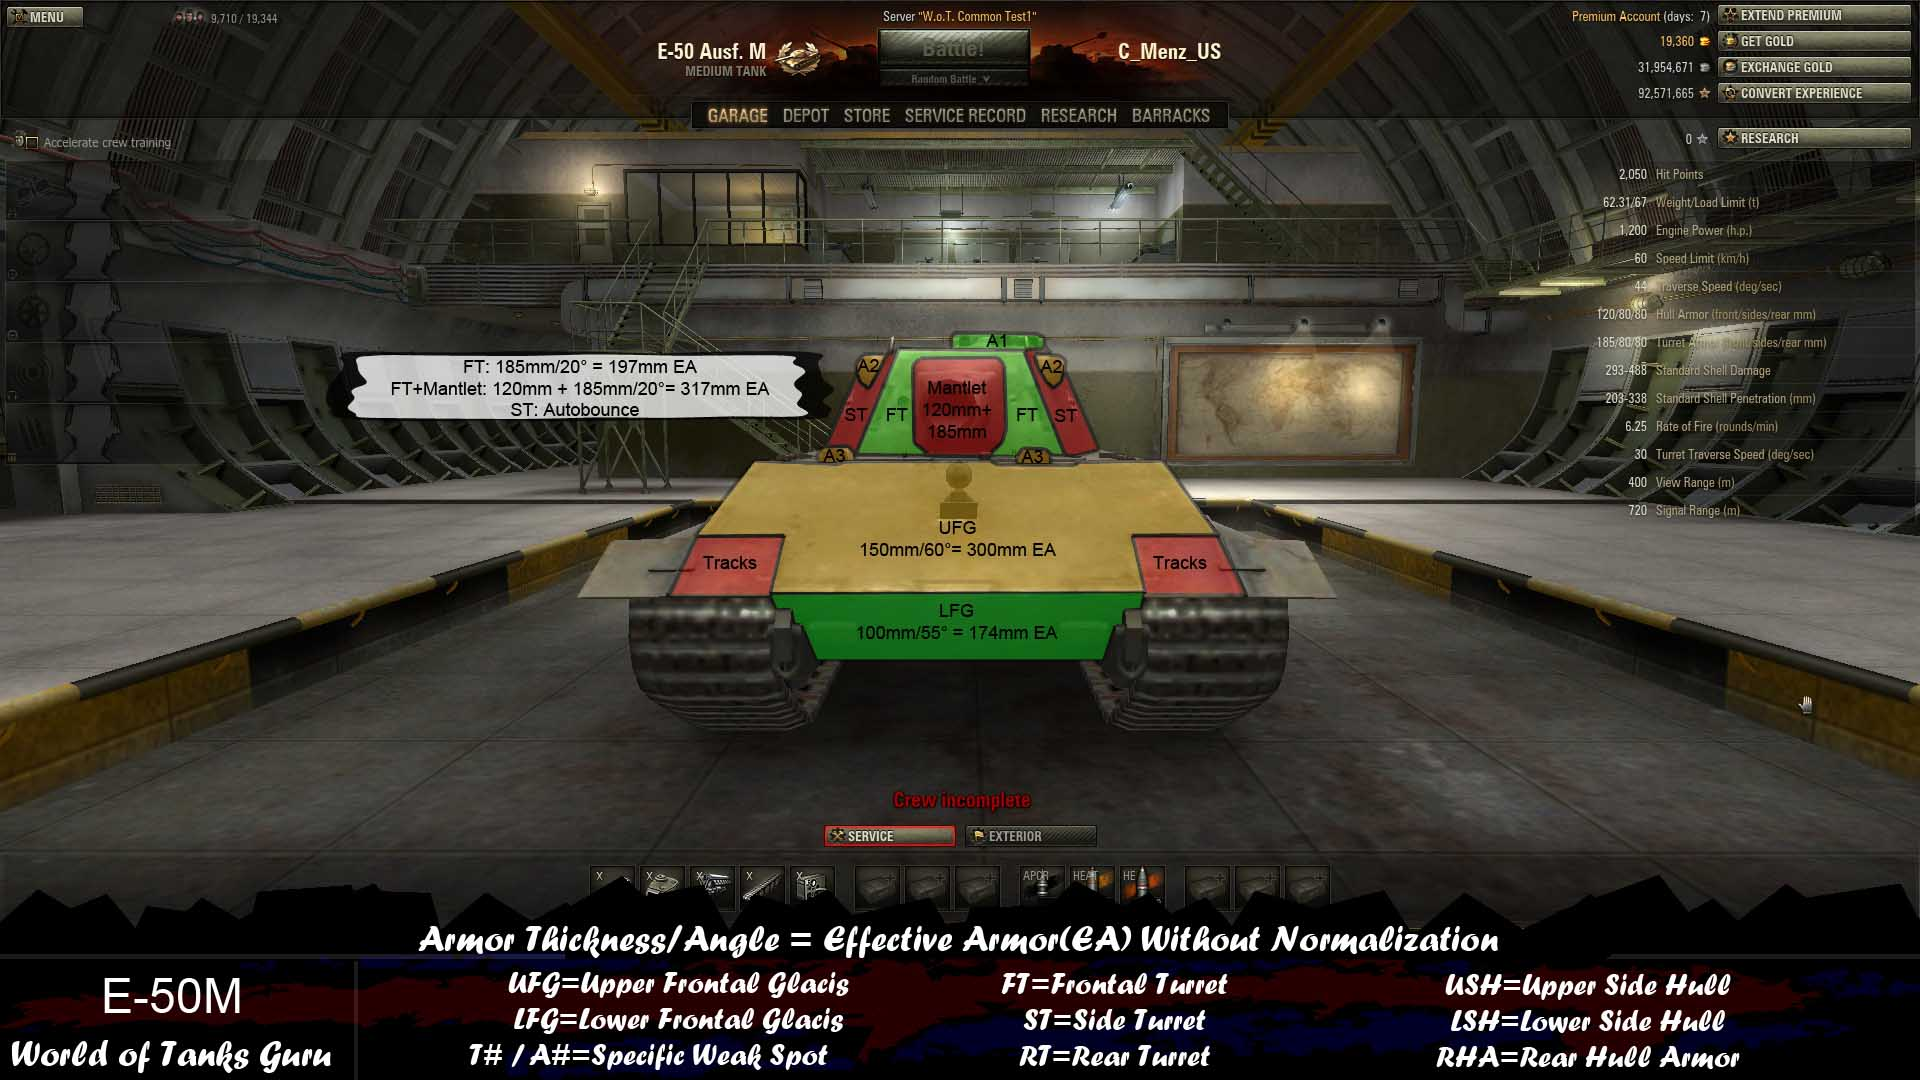 Weak Spot Guide: E-50/E-50 Ausf. M - World of Tanks Guru